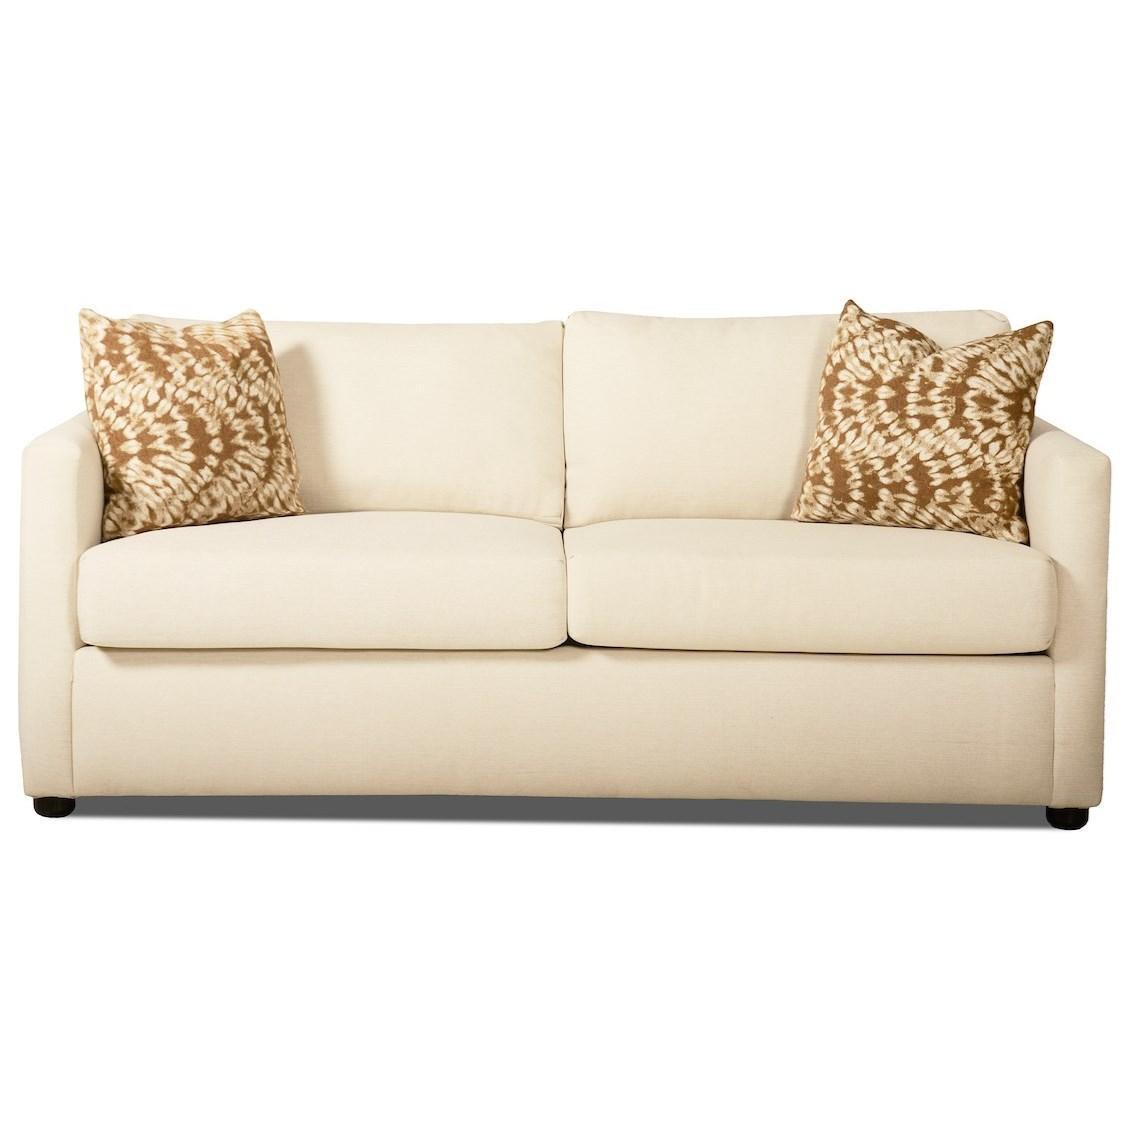 Jacobs Queen Sleeper Sofa w/ Dreamquest Mattress by Klaussner at Northeast Factory Direct